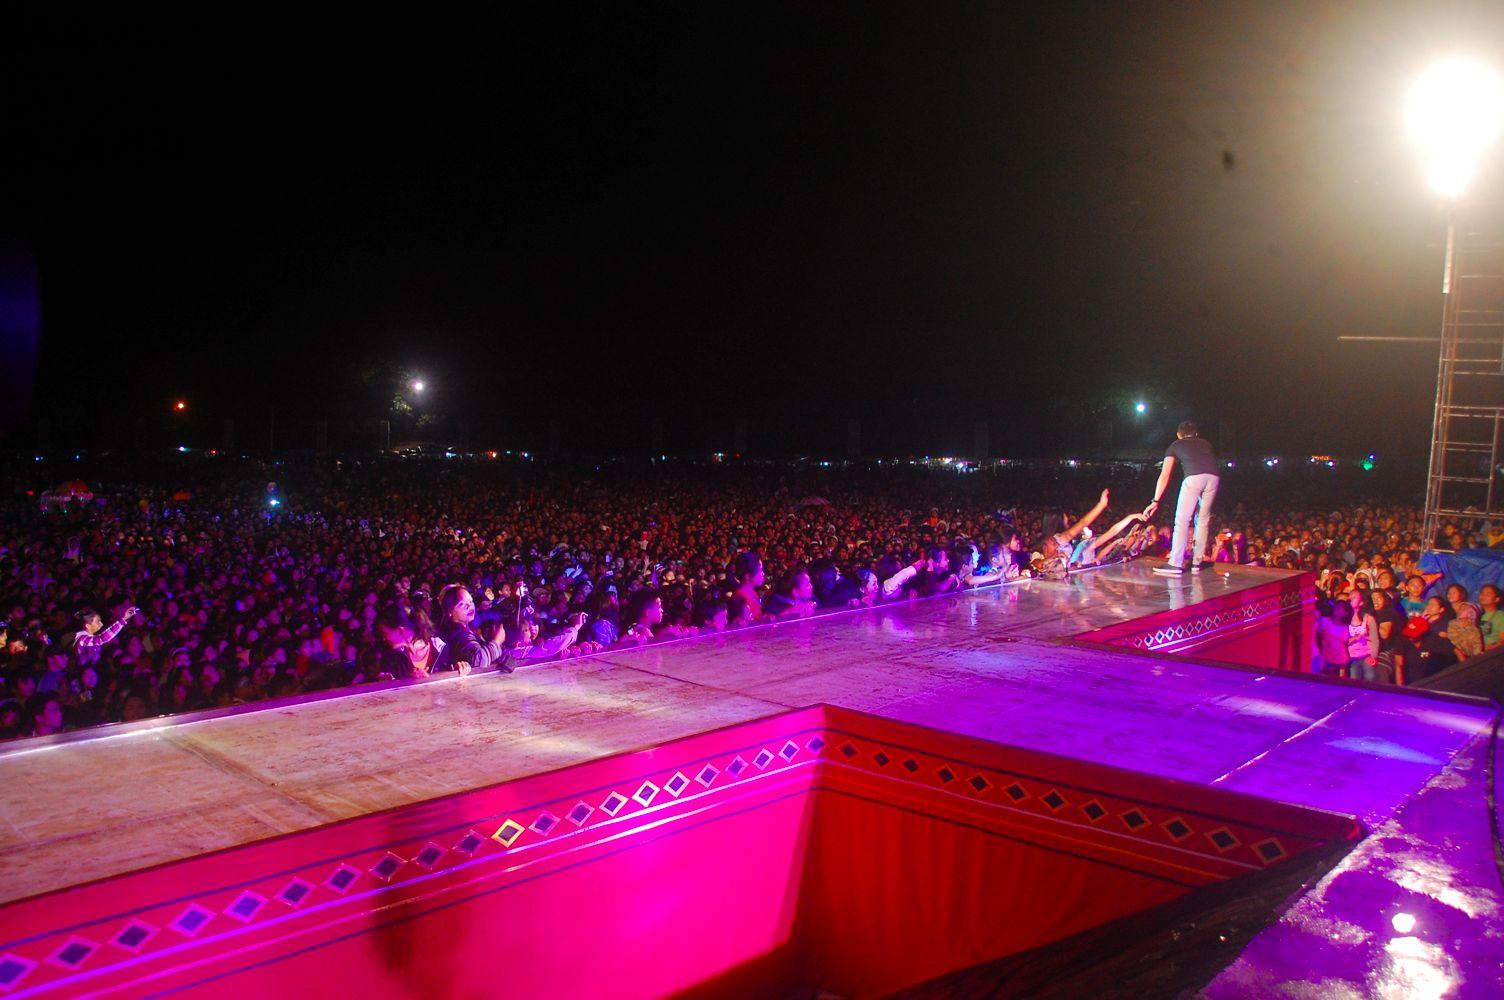 PHOTOS: Kapuso celebrities during Kaamulan Festival 2014 in Bukidnon